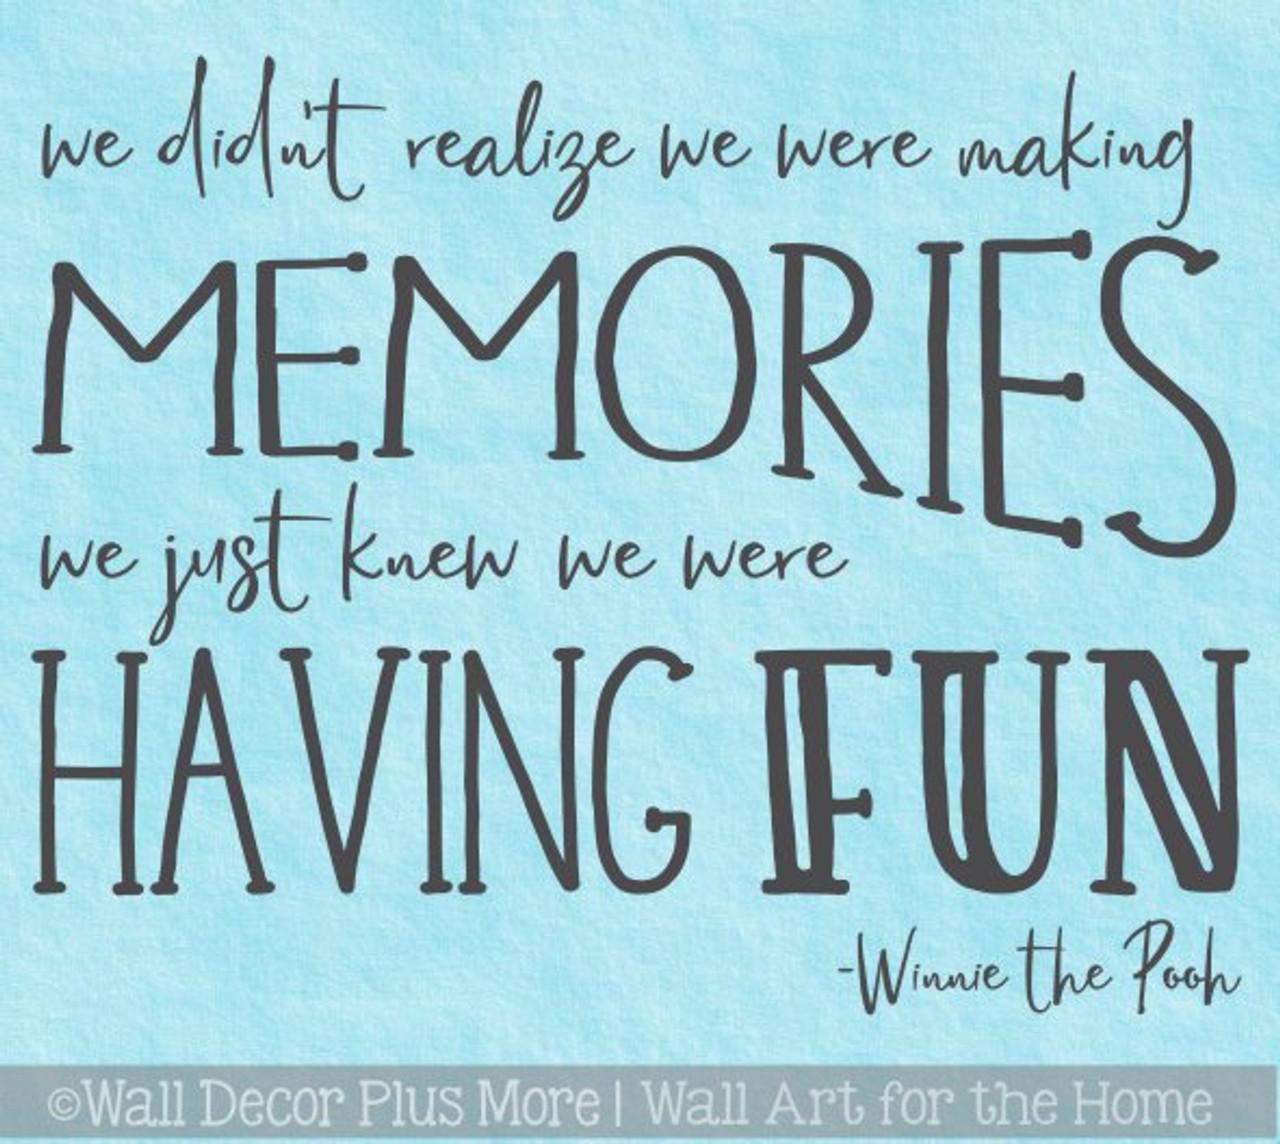 Kids Wall Decor Decal Making Memories Having Fun Playroom Quote Sticker